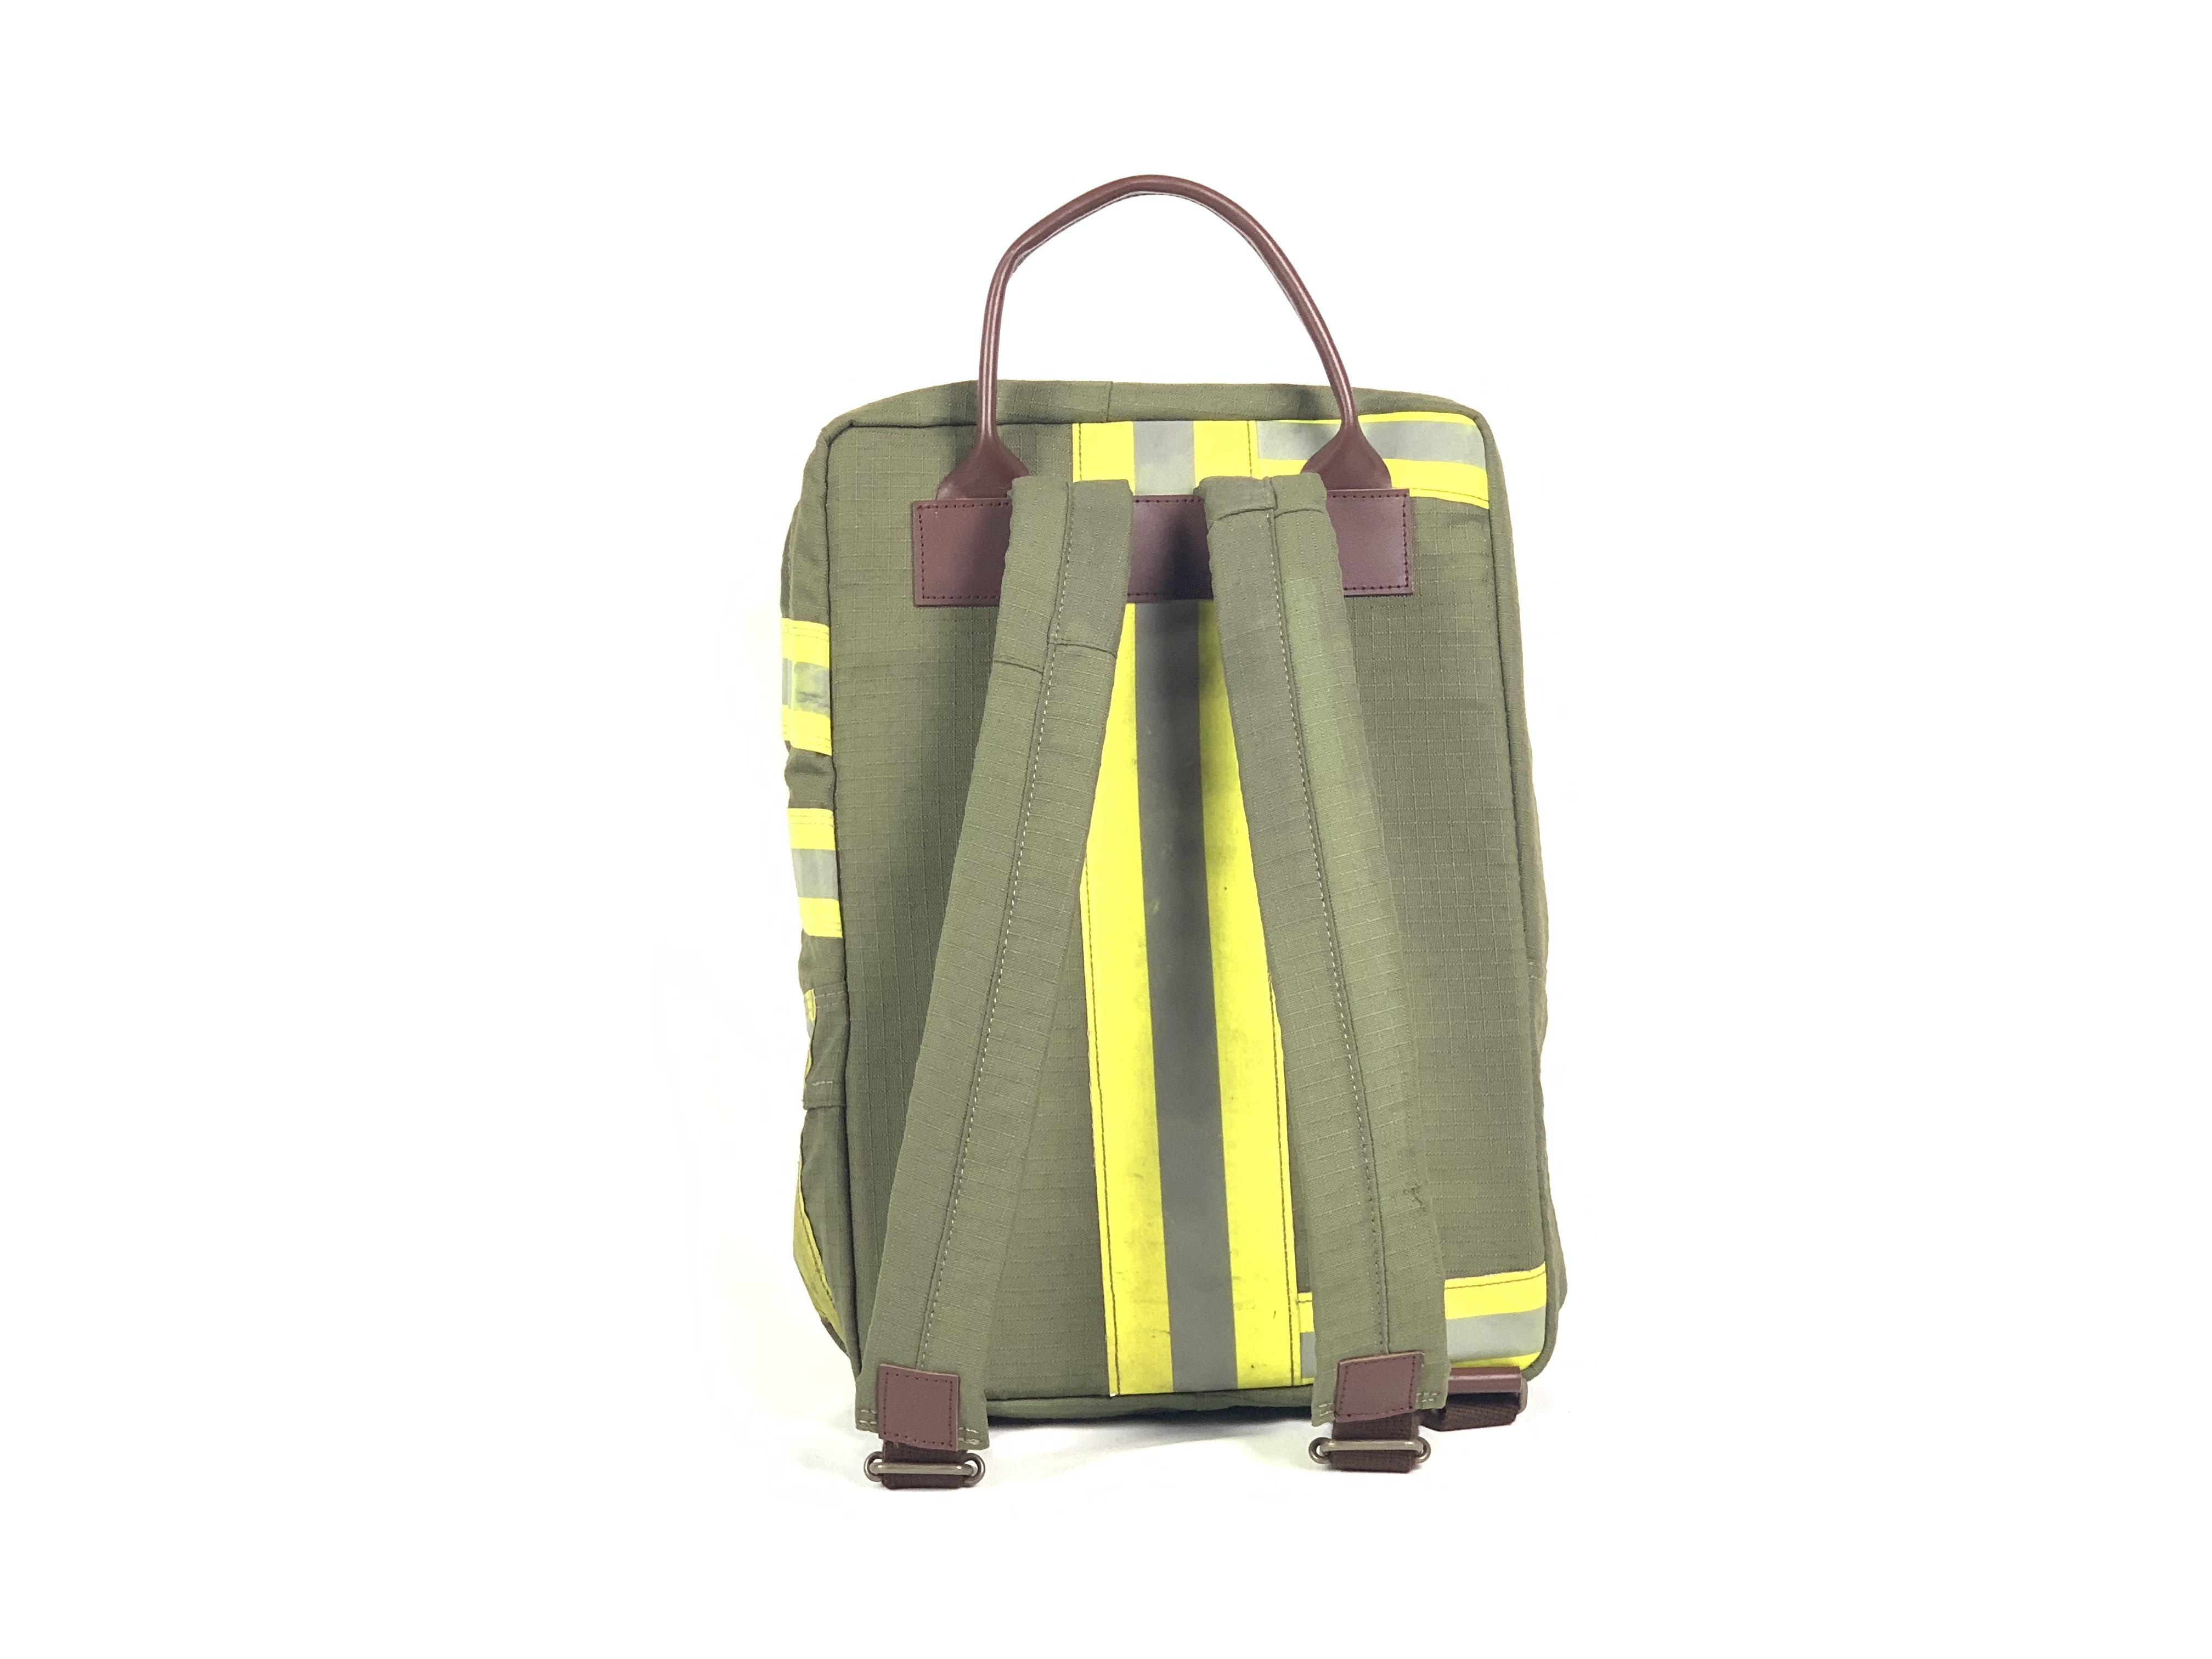 Modeco Bag #2